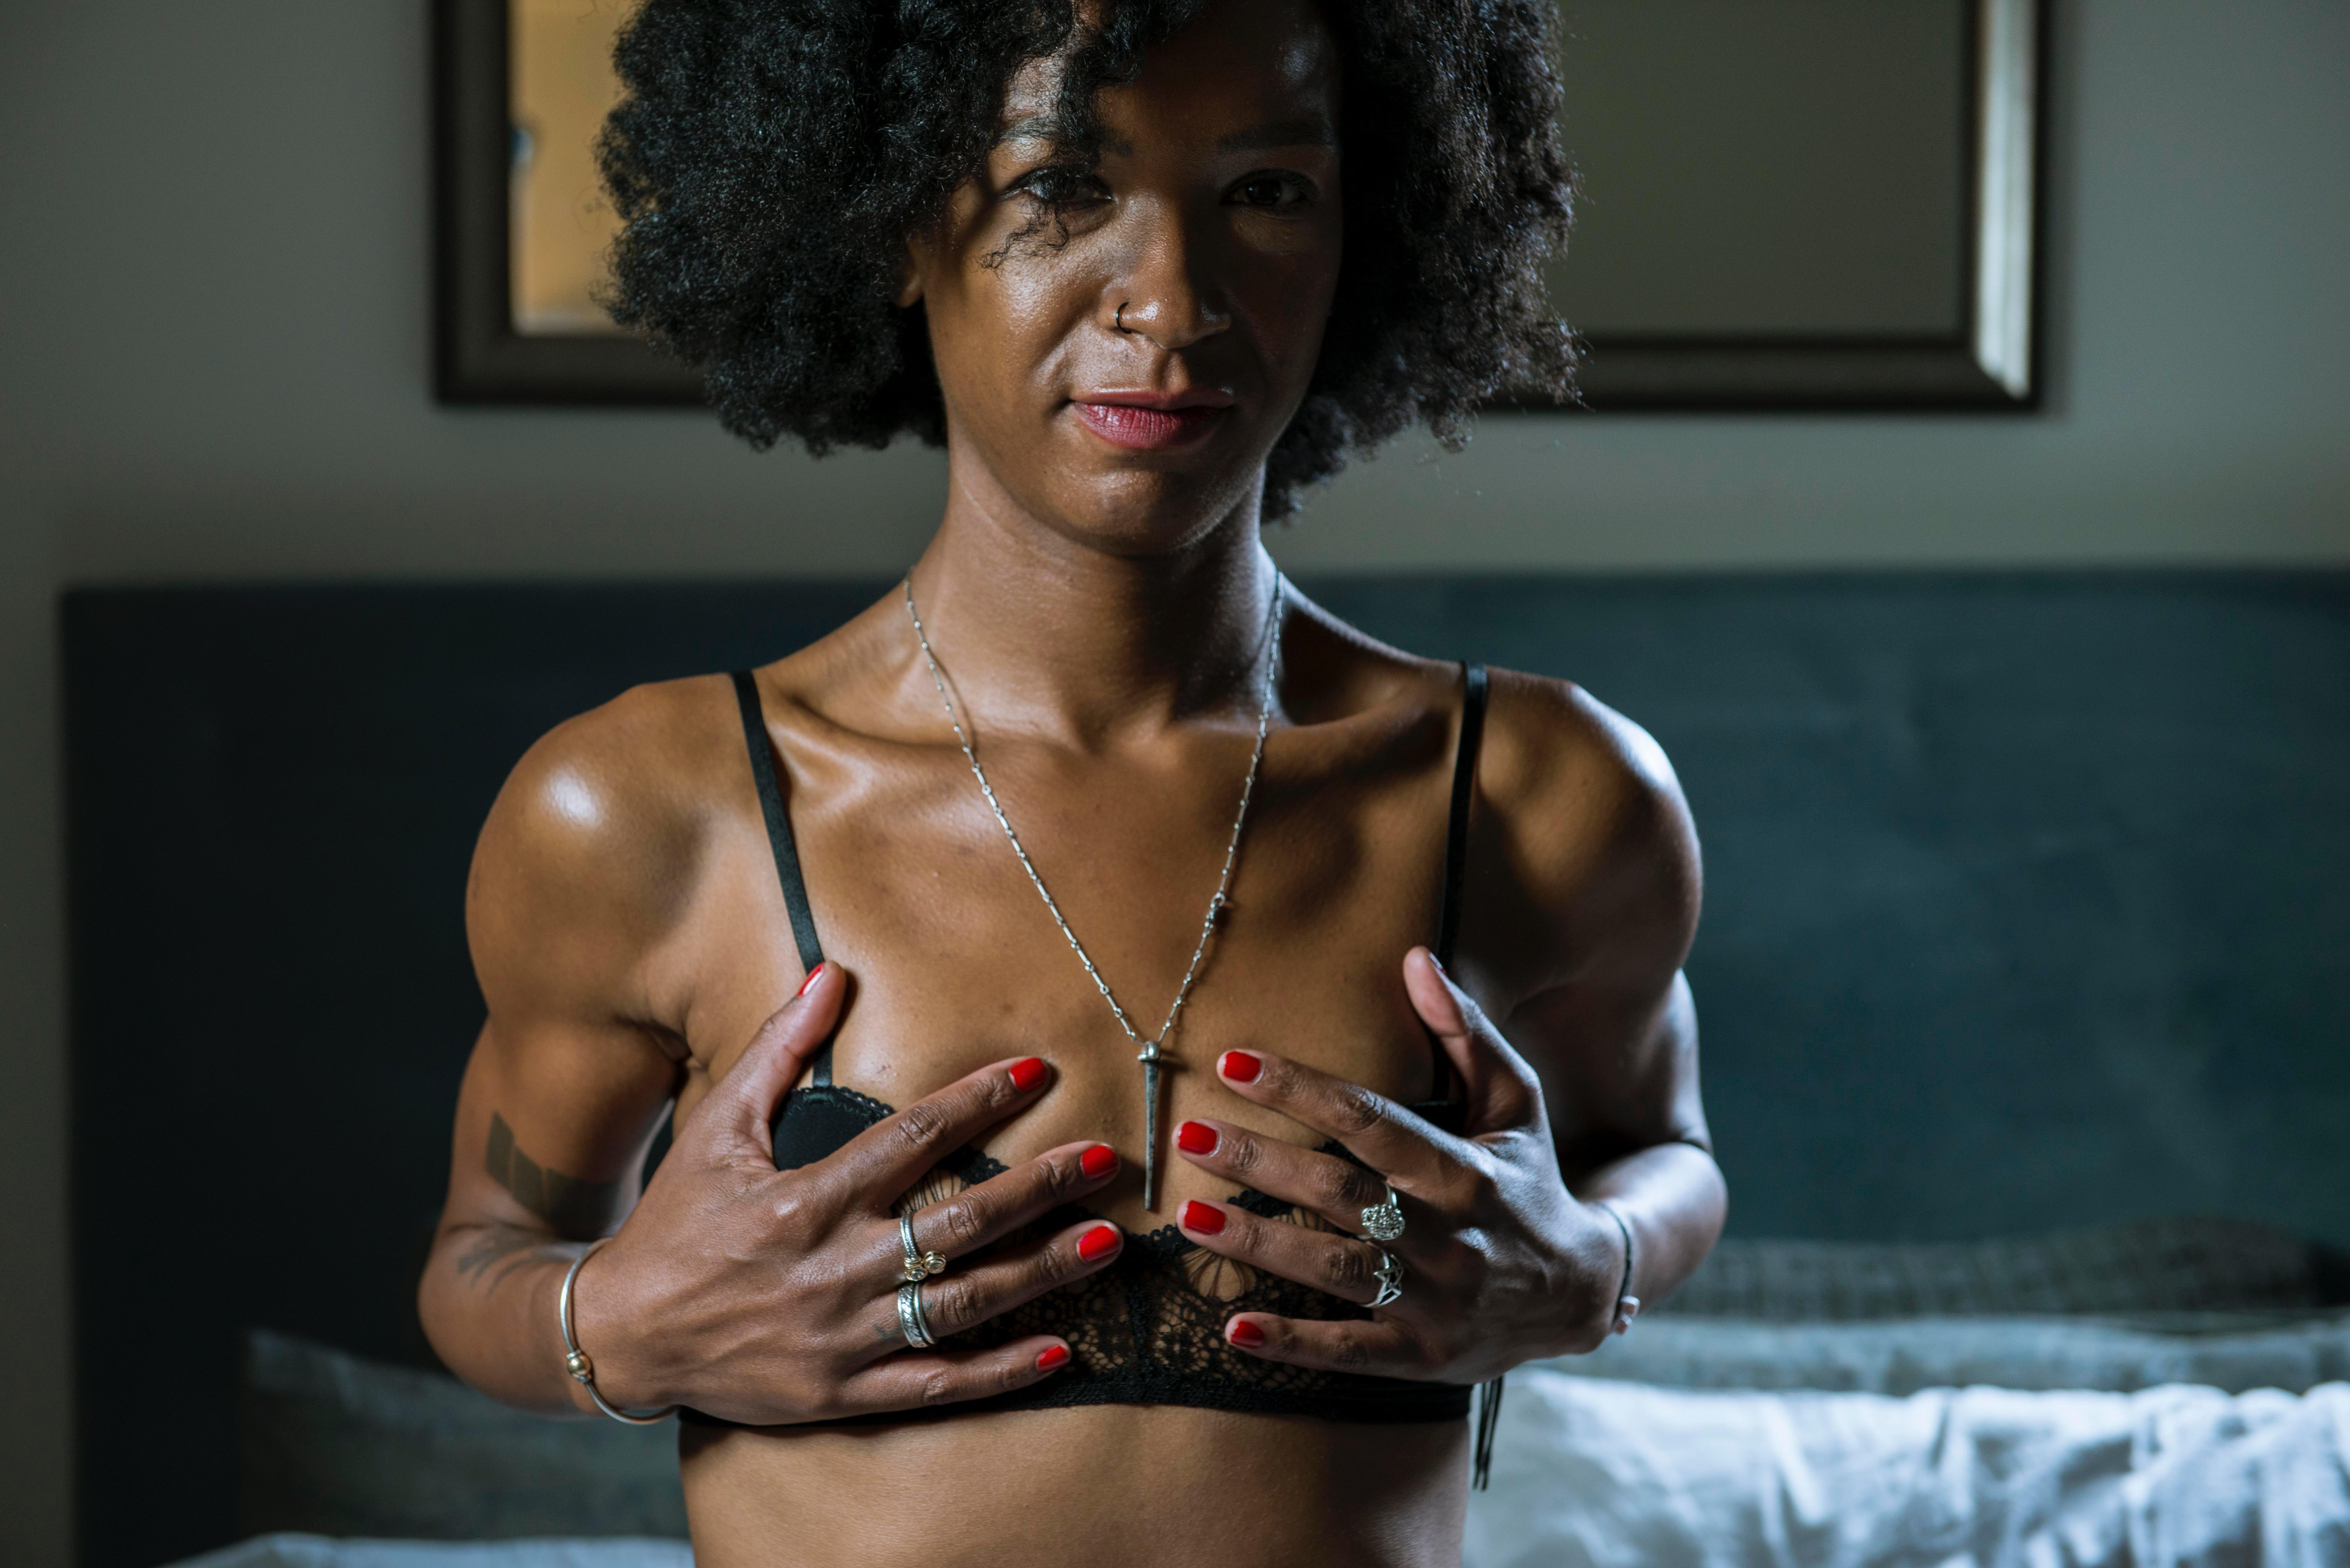 Women preparing them for sex